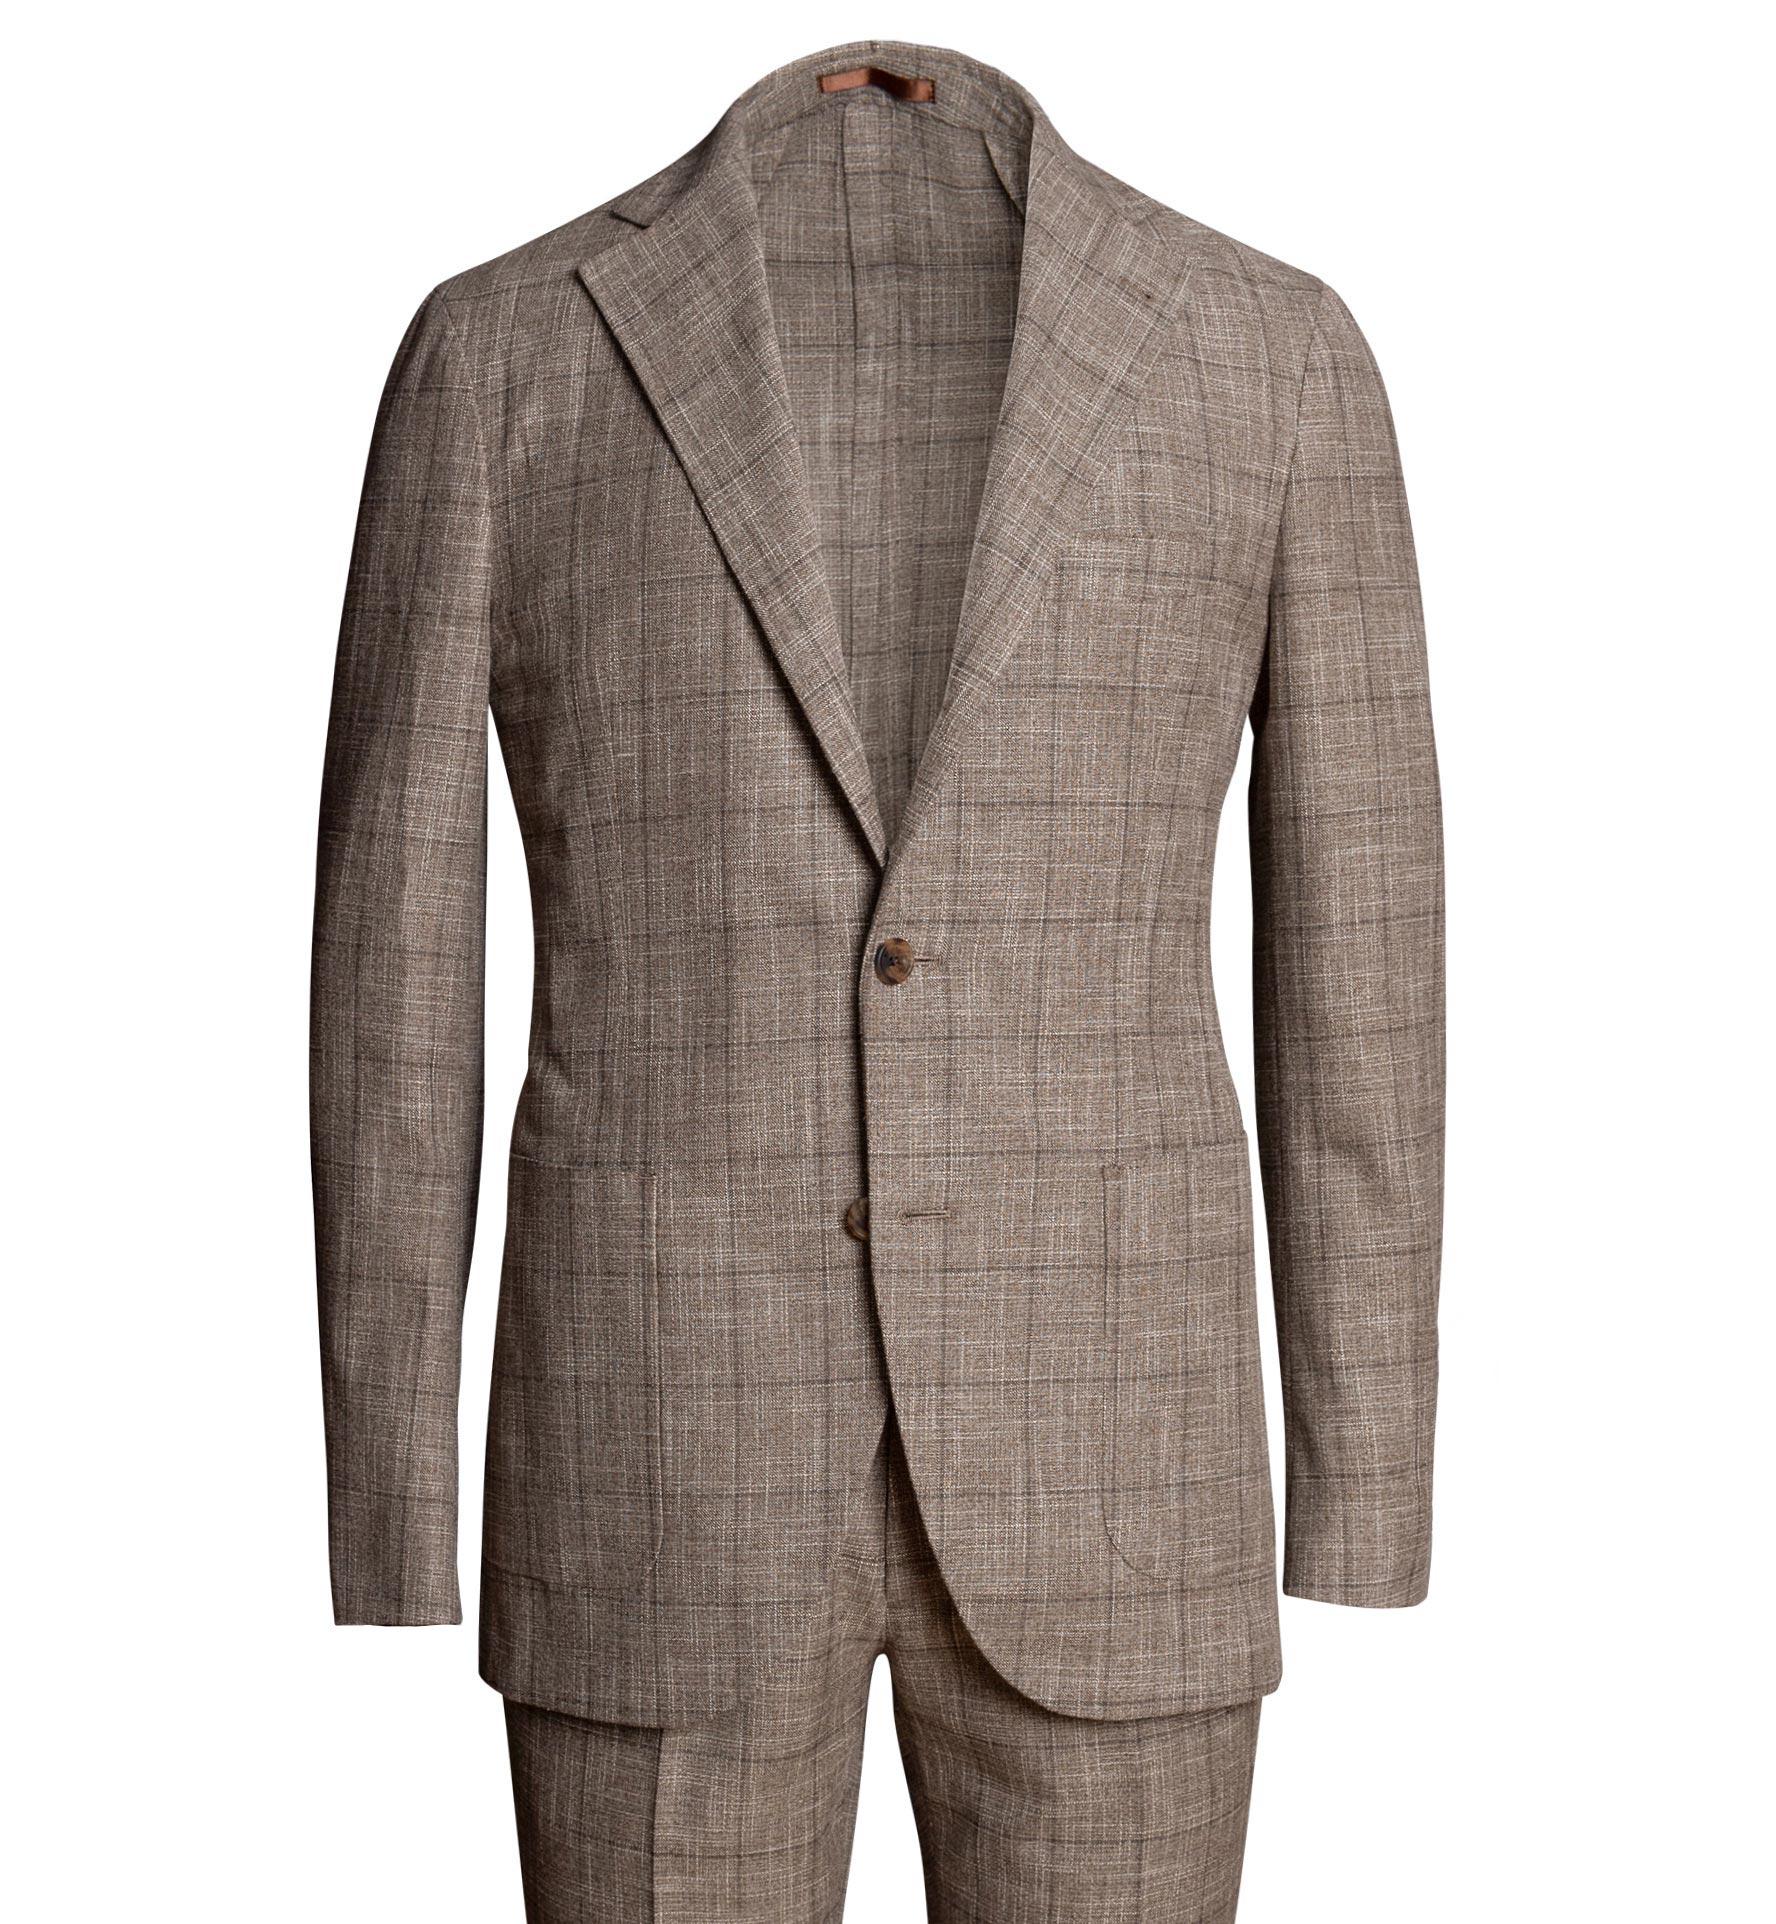 Zoom Image of Waverly Mocha Windowpane Slub Wool Blend Suit